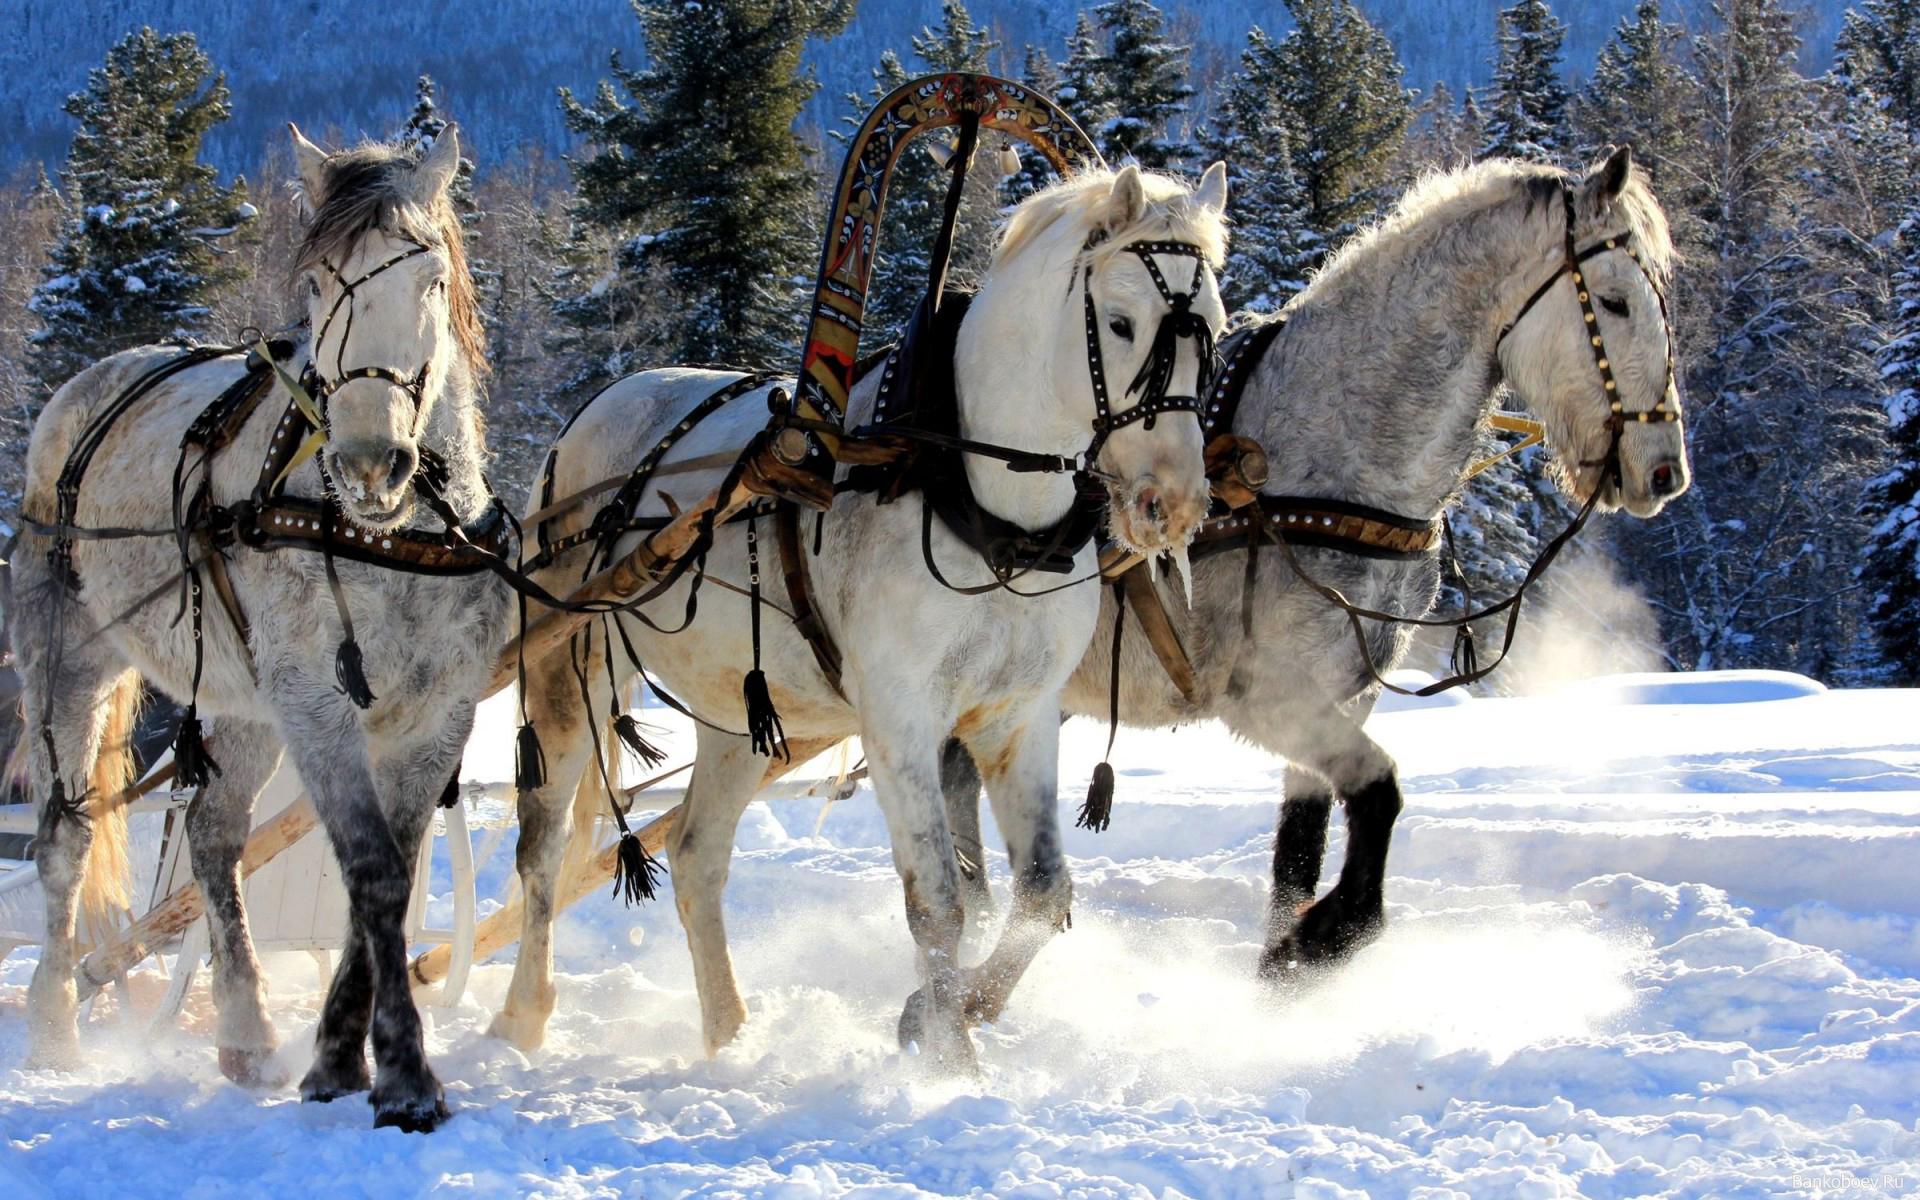 christmas sleigh horses 1920x1080 wallpaper - photo #1